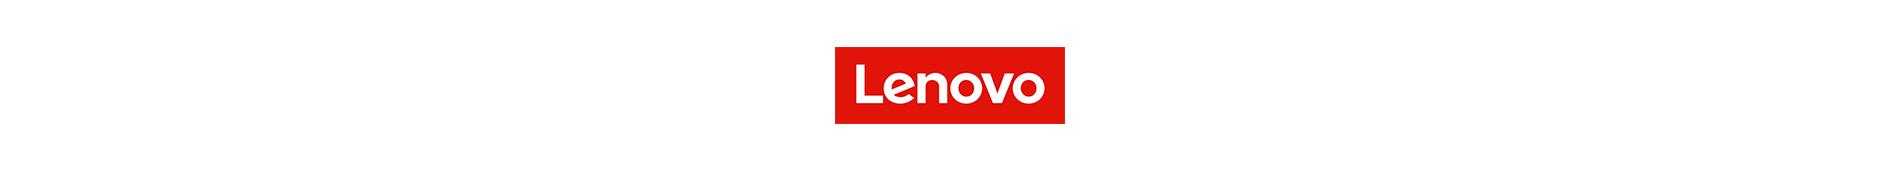 Lenovo General Btm Banner  Banner 01